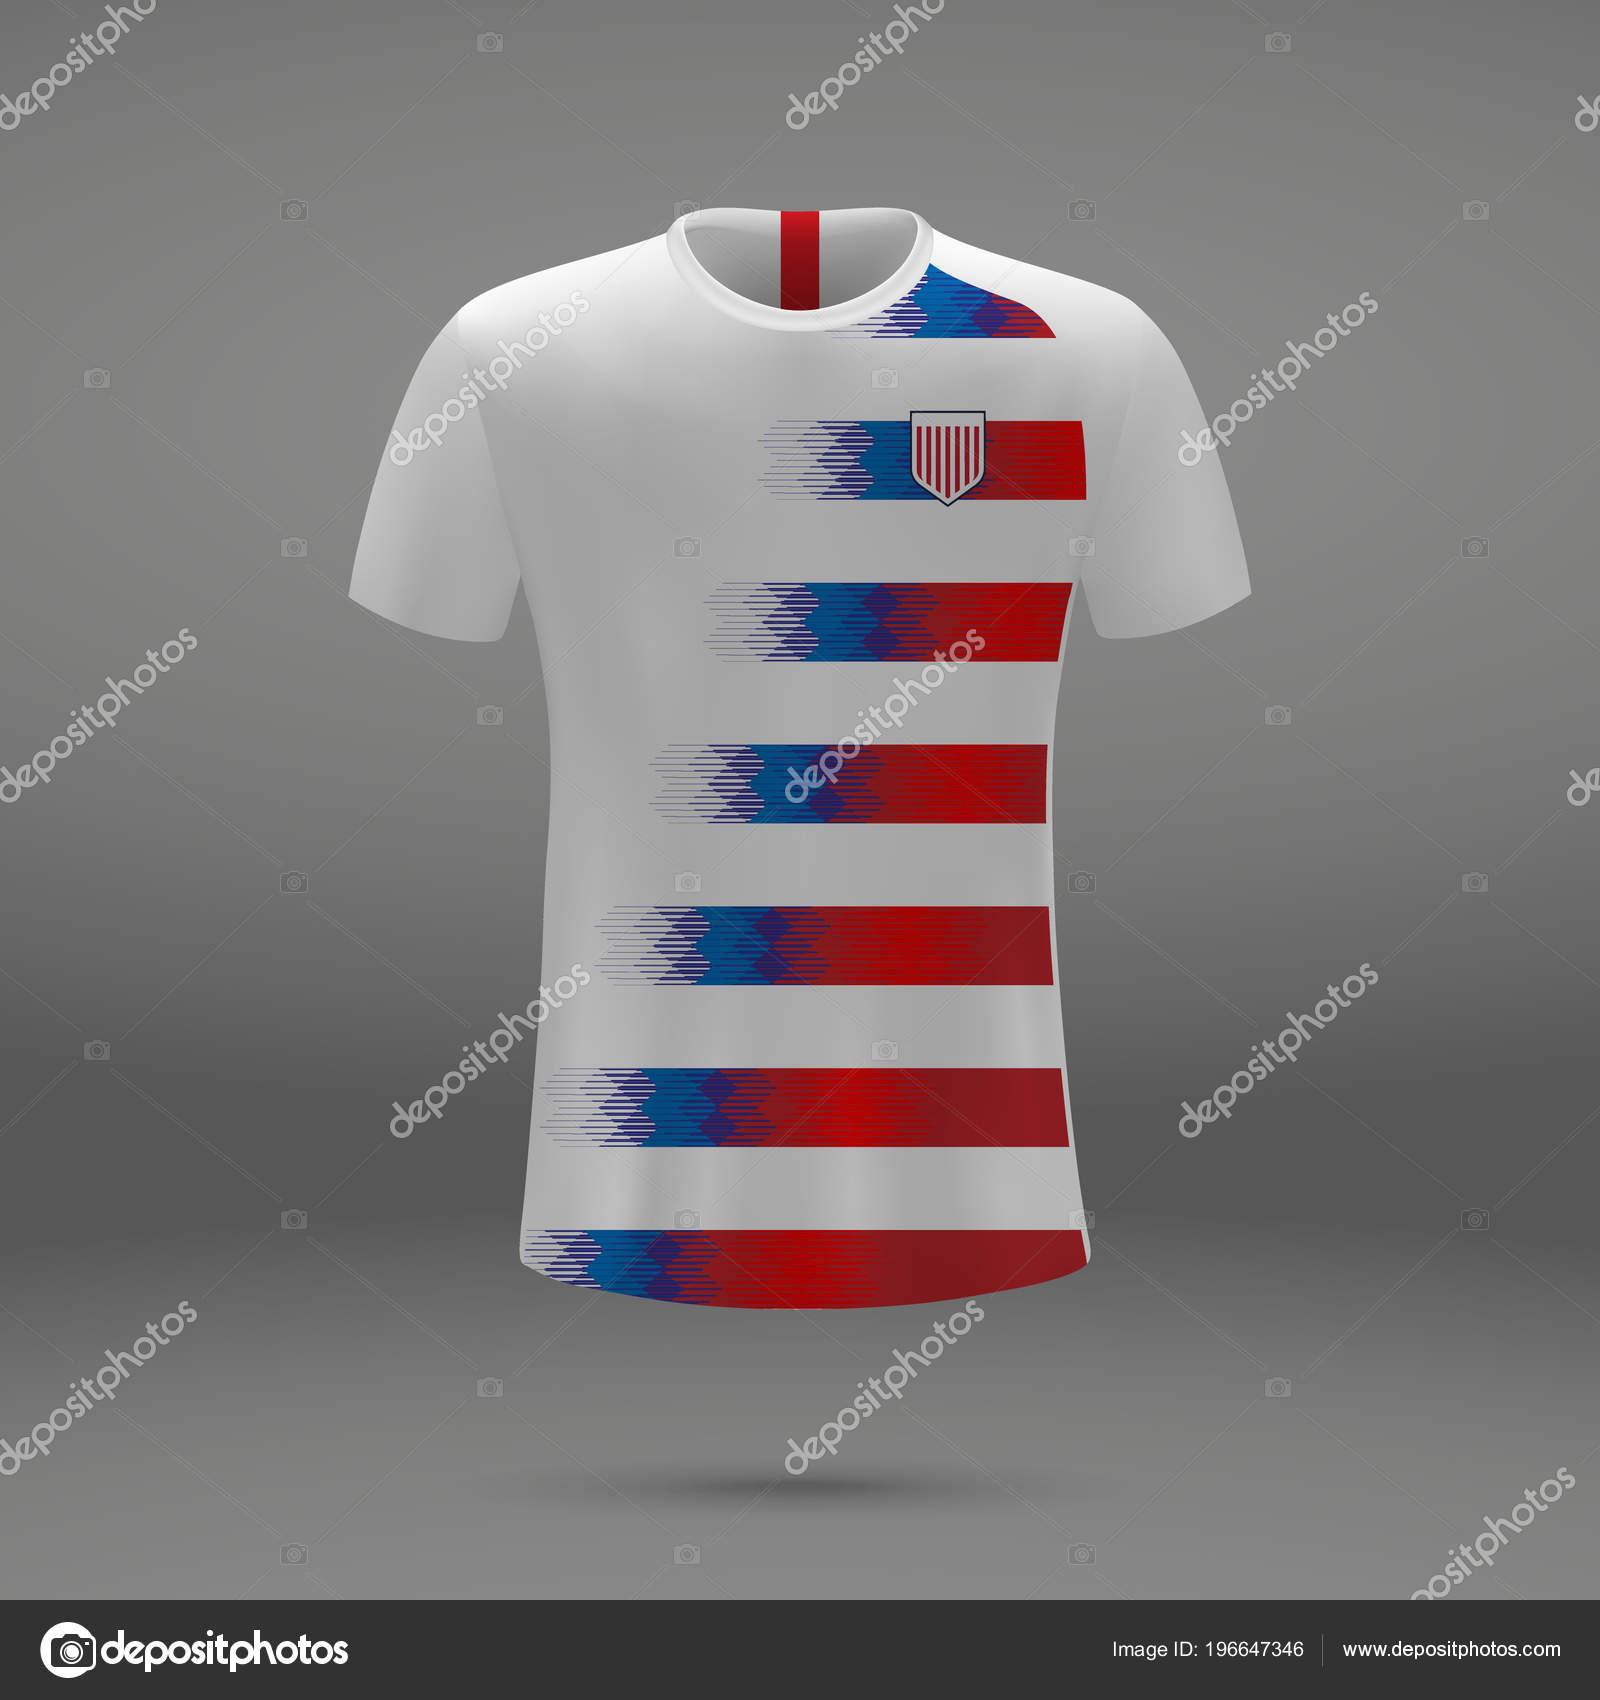 Kit Football Des Usa Modele Shirt Pour Maillot Football Illustration